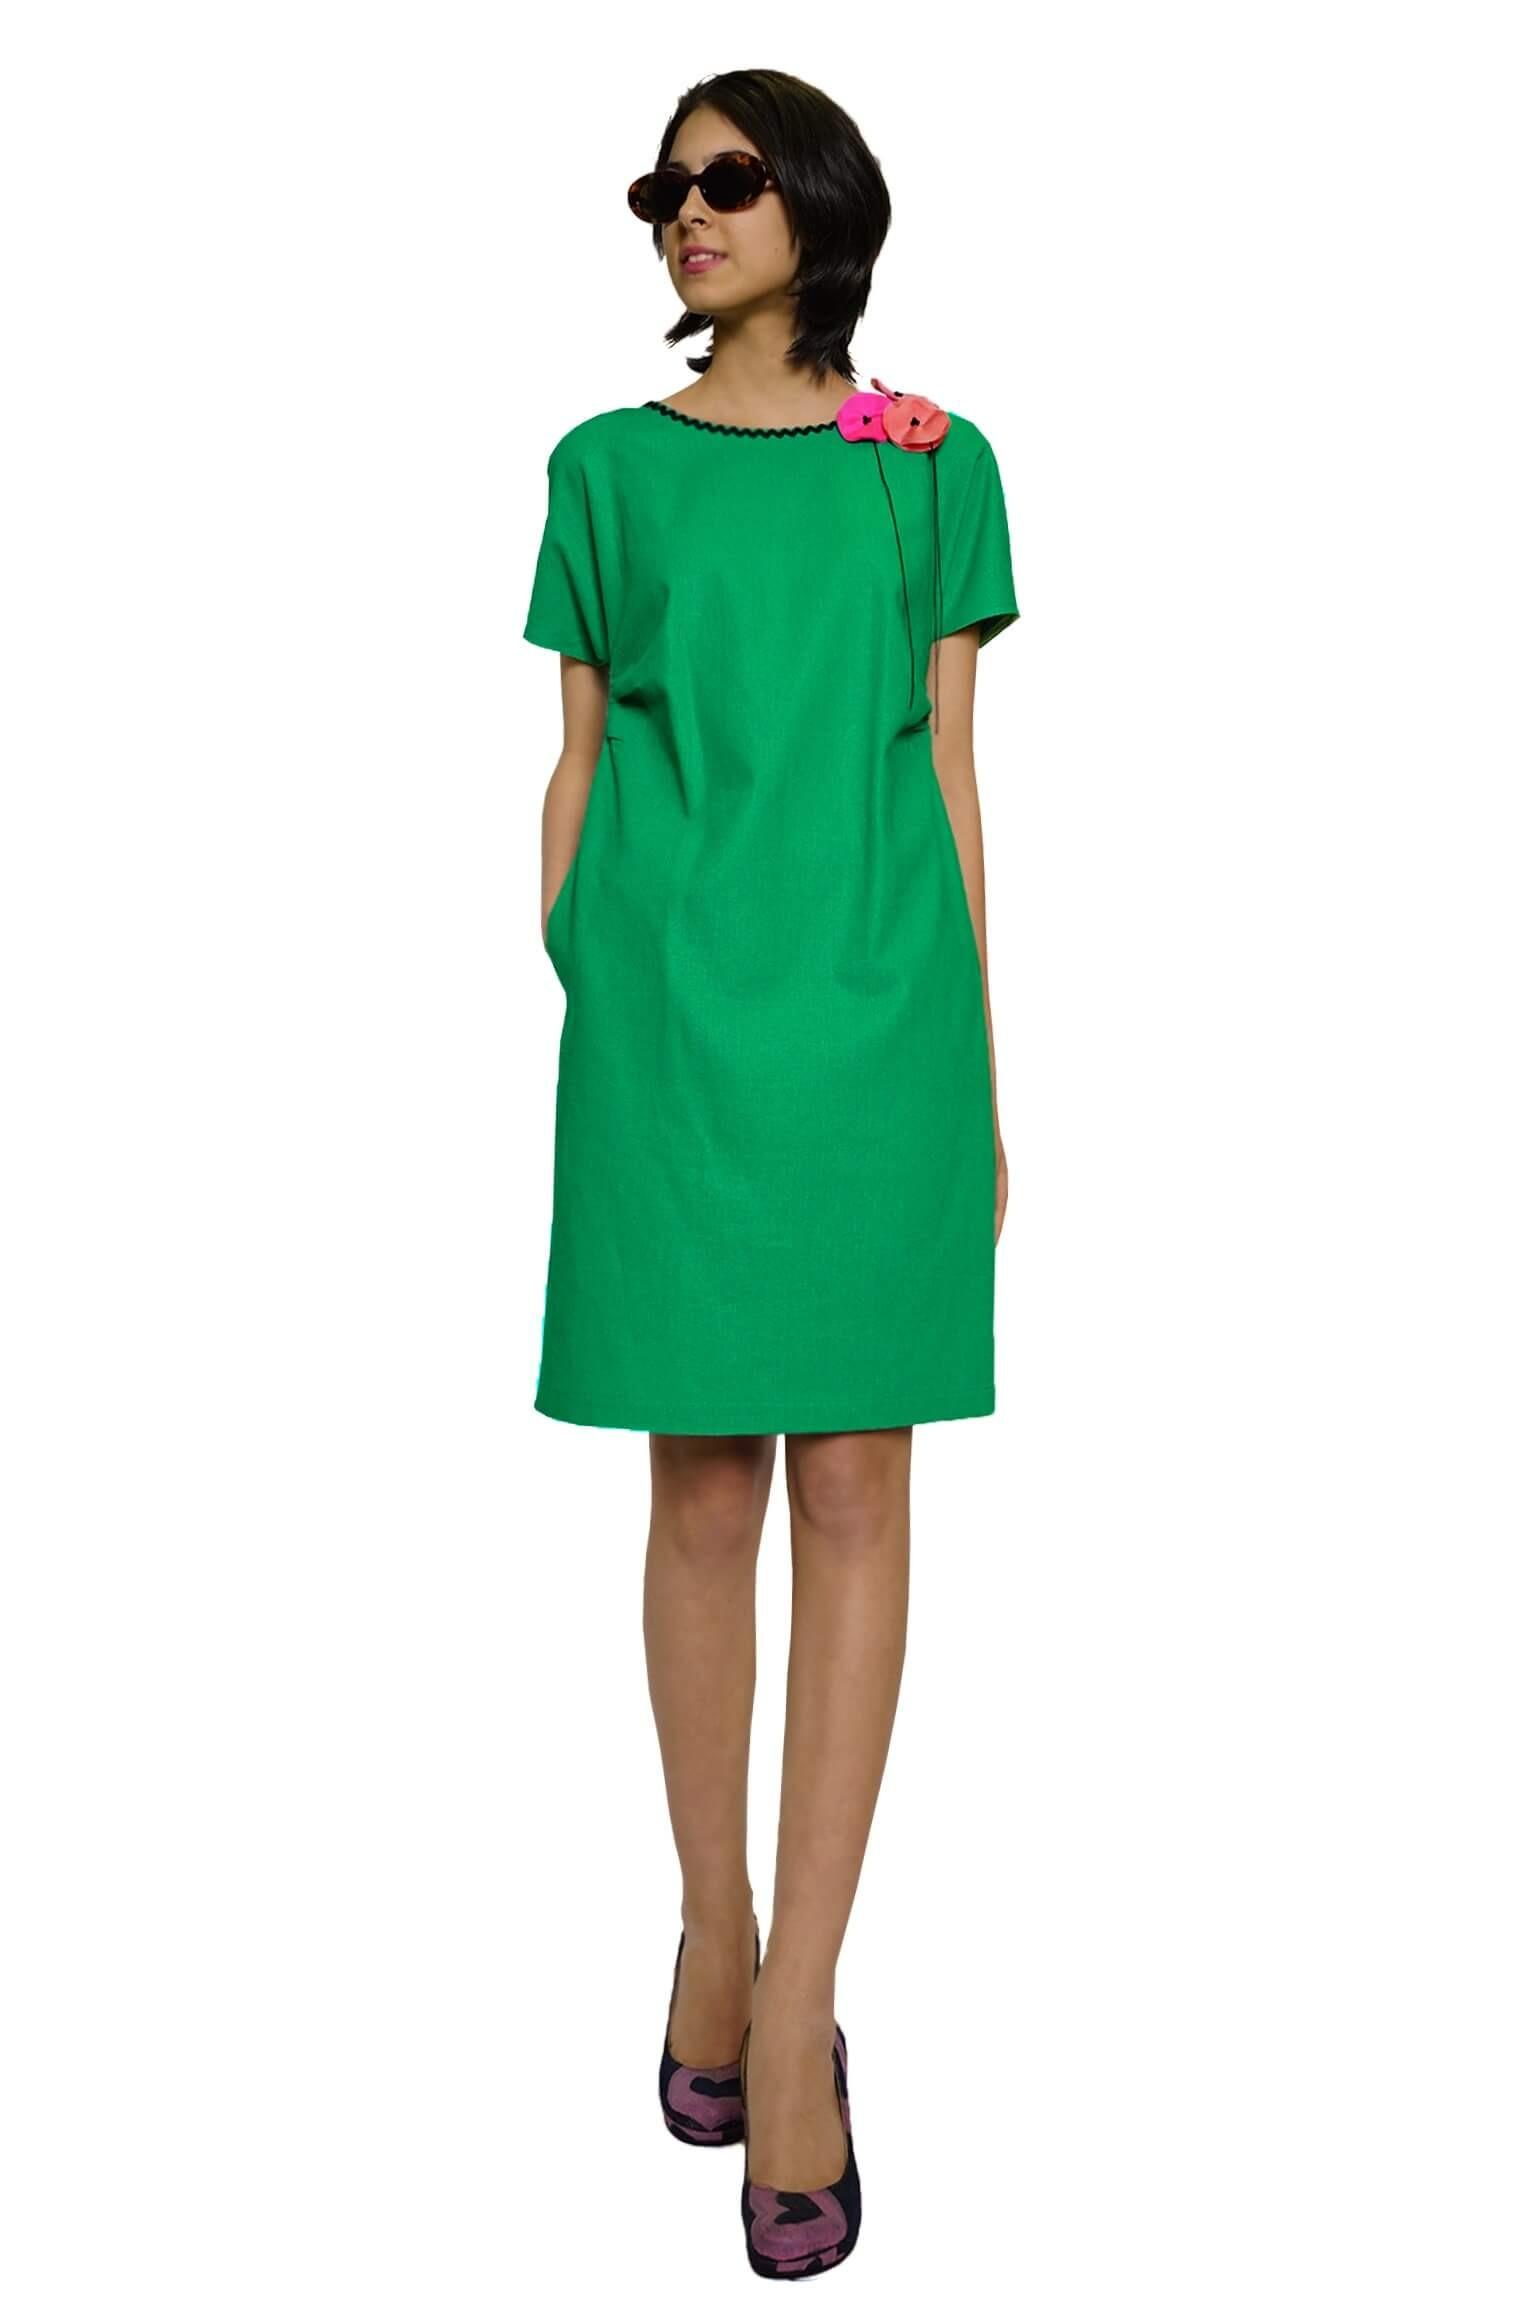 Green linen kimono dress